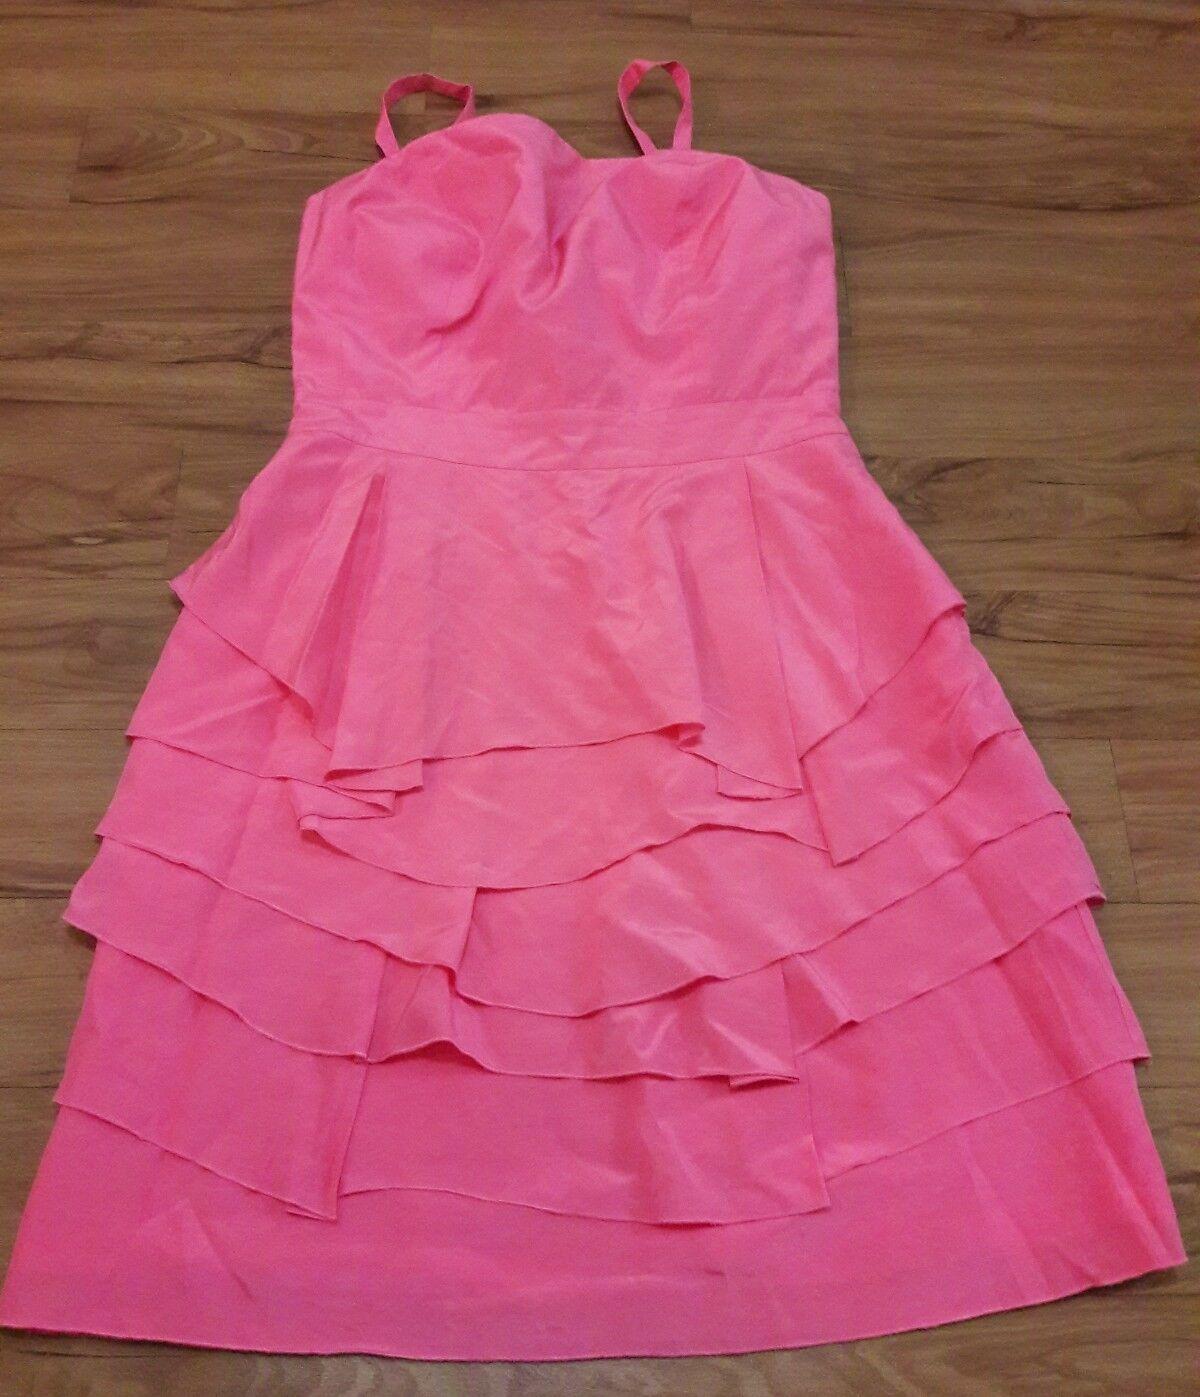 Antonio Melani Strapless Party Dress damen 6 Rosa Cotton Silk Tier Layer Empire